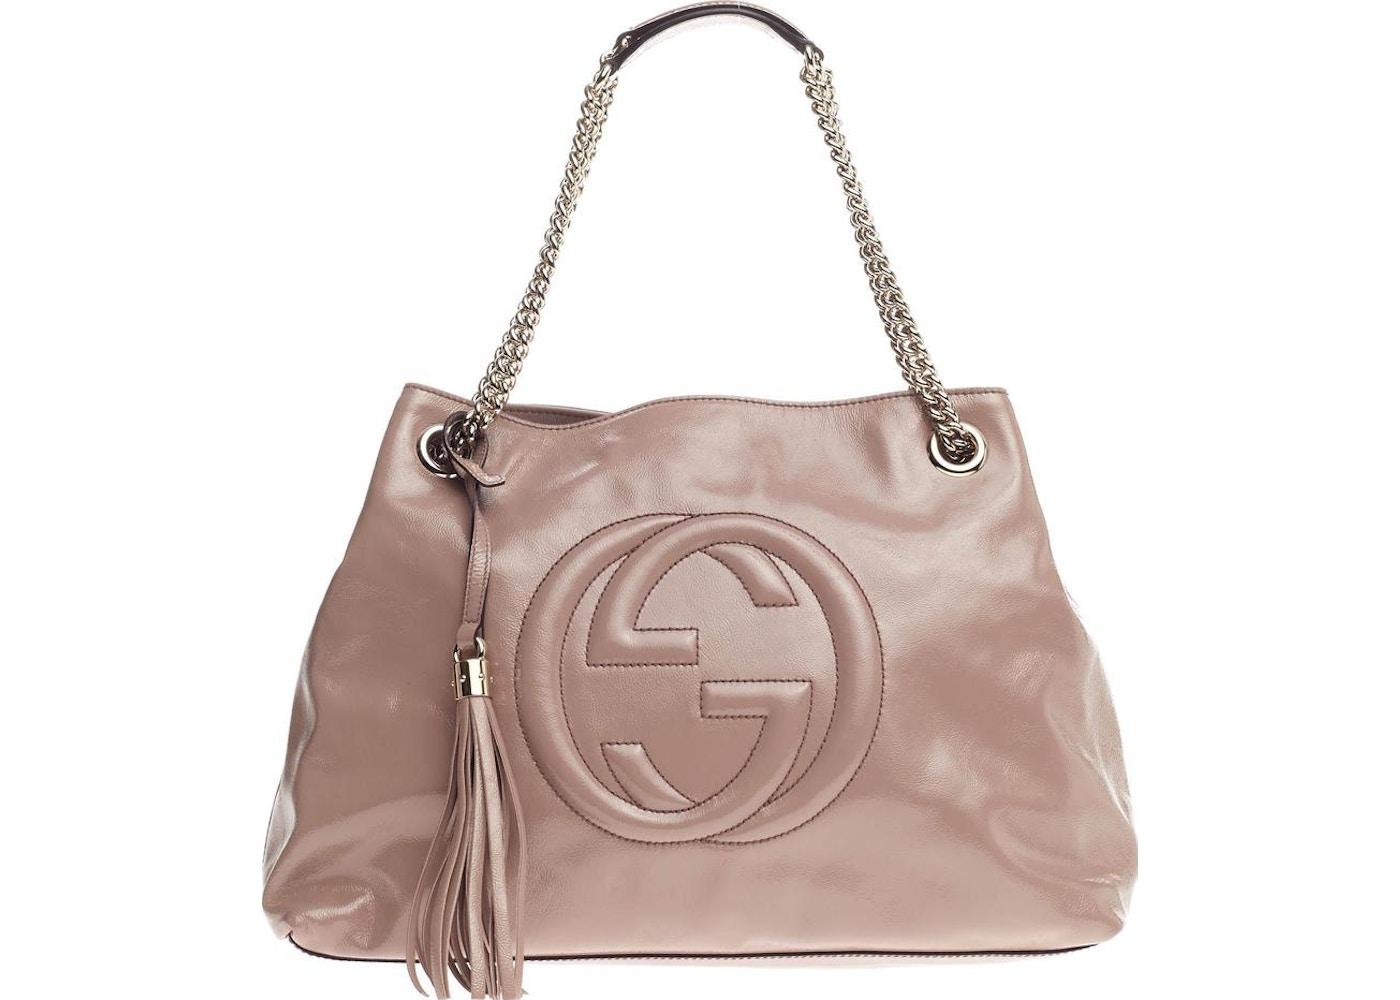 660b57f1a Gucci Soho Chain Strap Shoulder GG Interlocking Gucci Logo ...